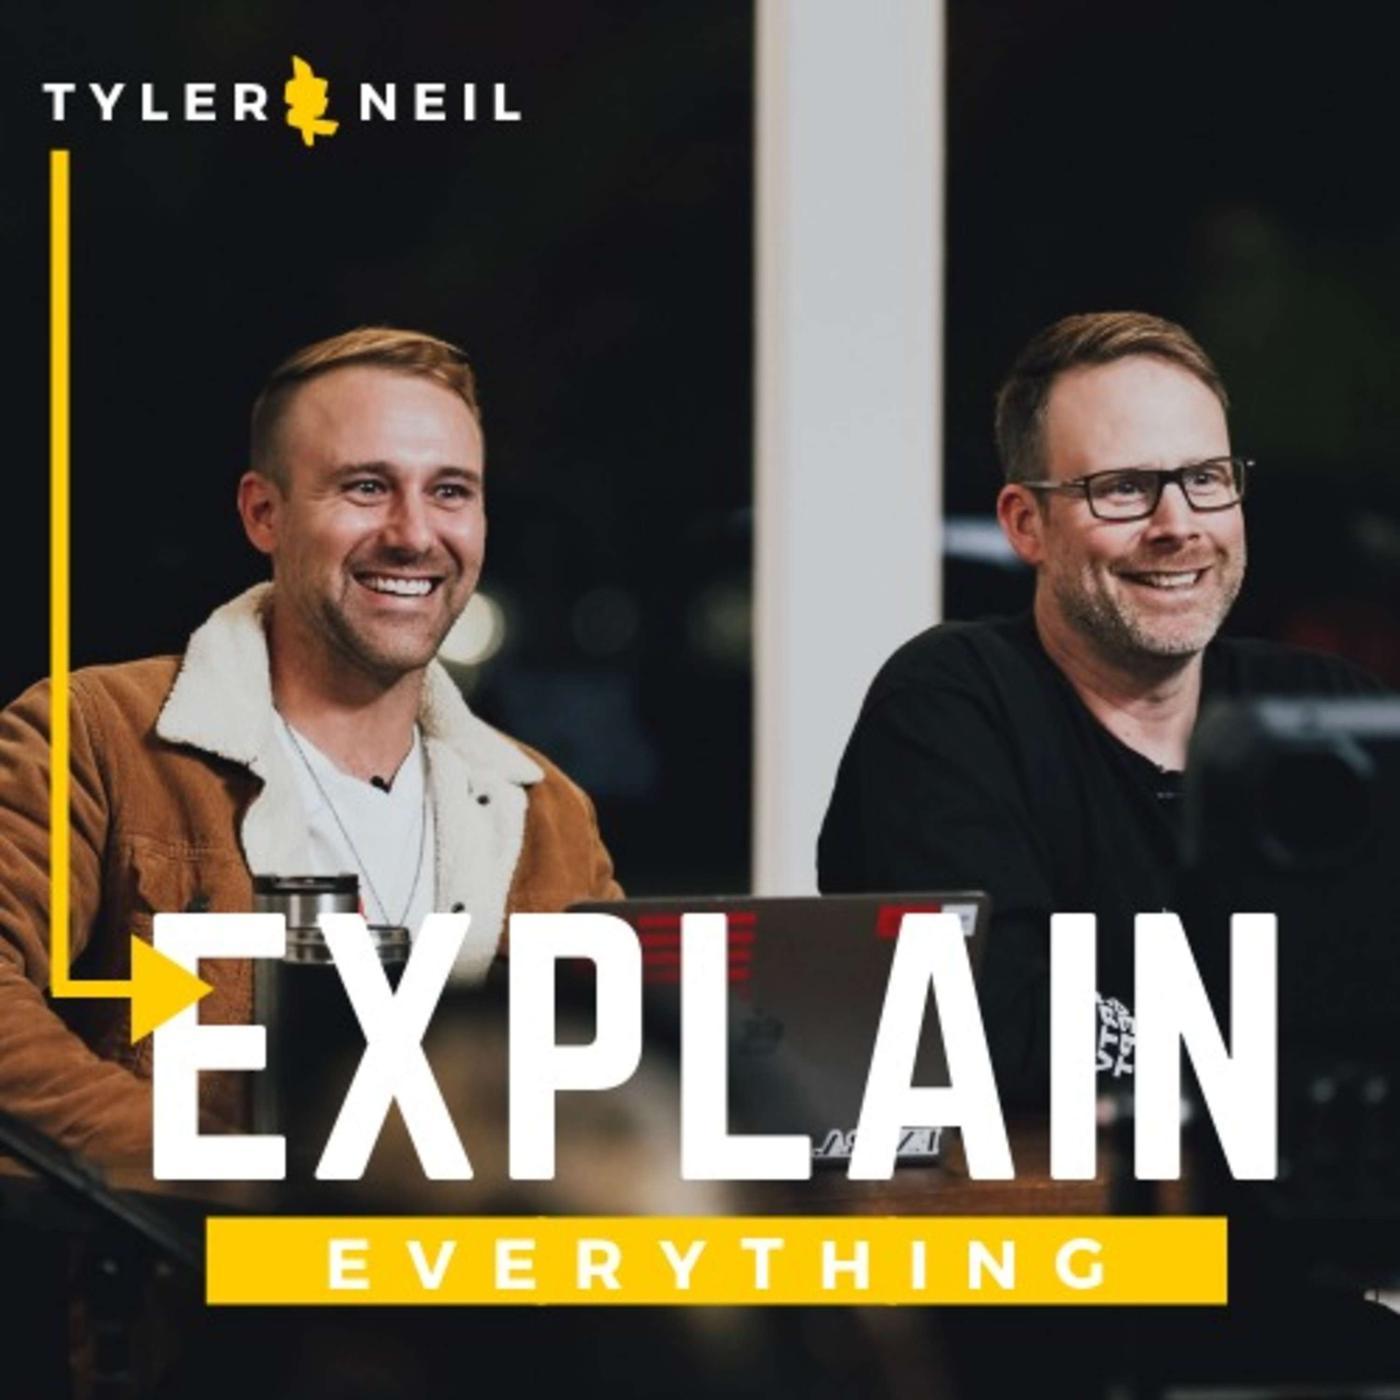 tyler-neil-explain-everything-B-vzl5js_Ru-ongrI6vZc_3.1400x1400.jpg